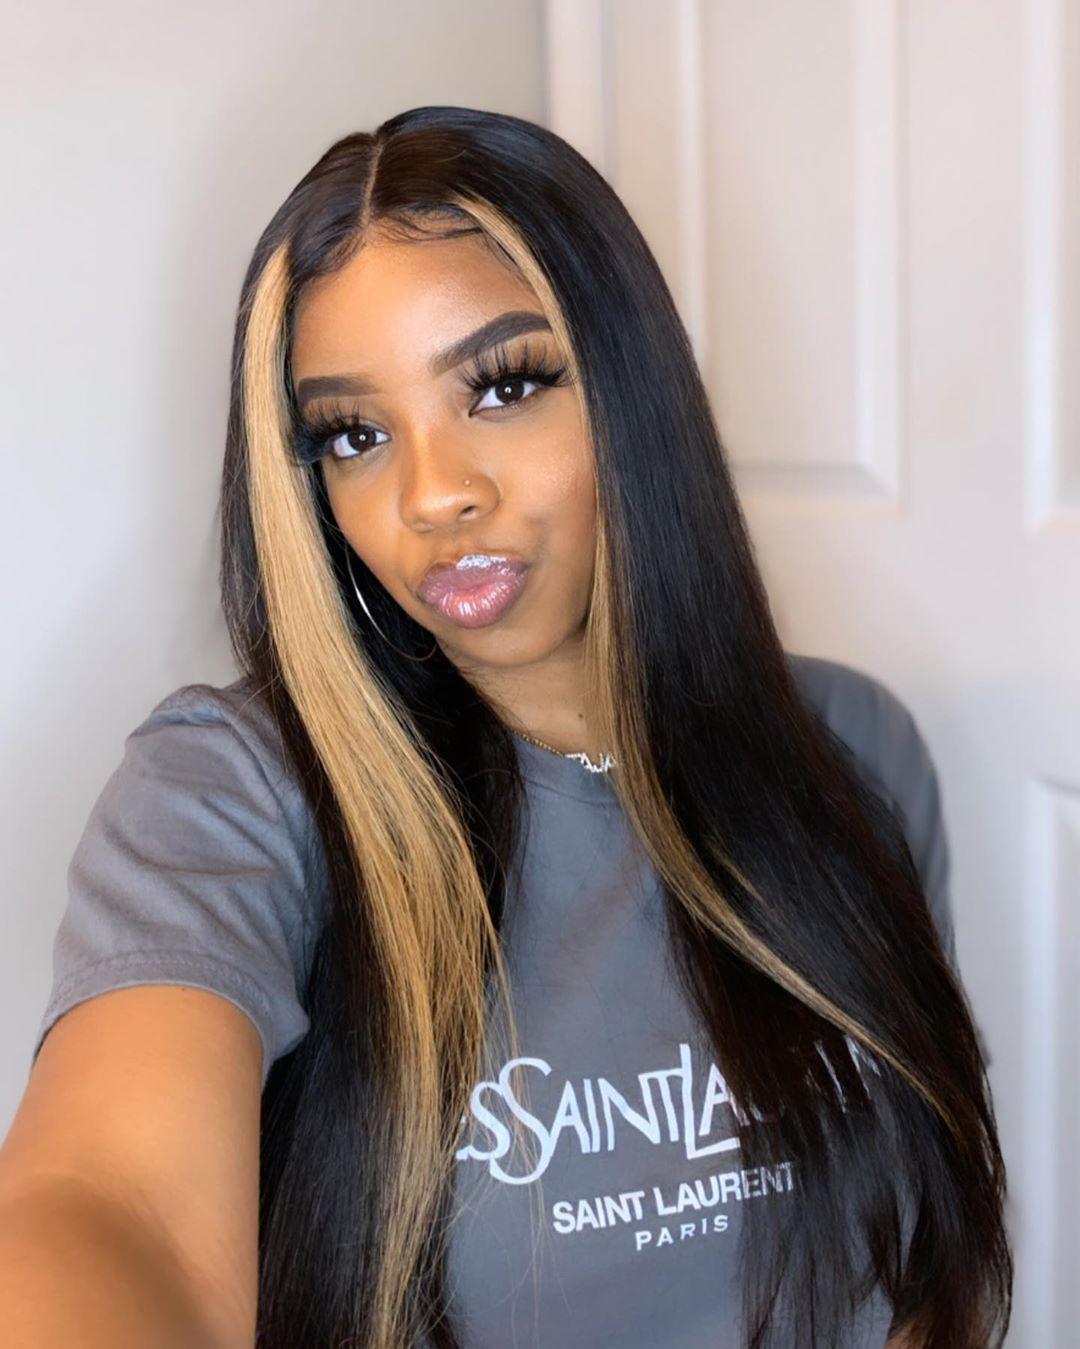 Thriving Hair Virgin Human Hair Straight Mahogany Brown With Dark Blonde Front Streaks Lace Front Wigs V96 Front46 In 2020 Straight Hairstyles Lace Front Wigs Hair